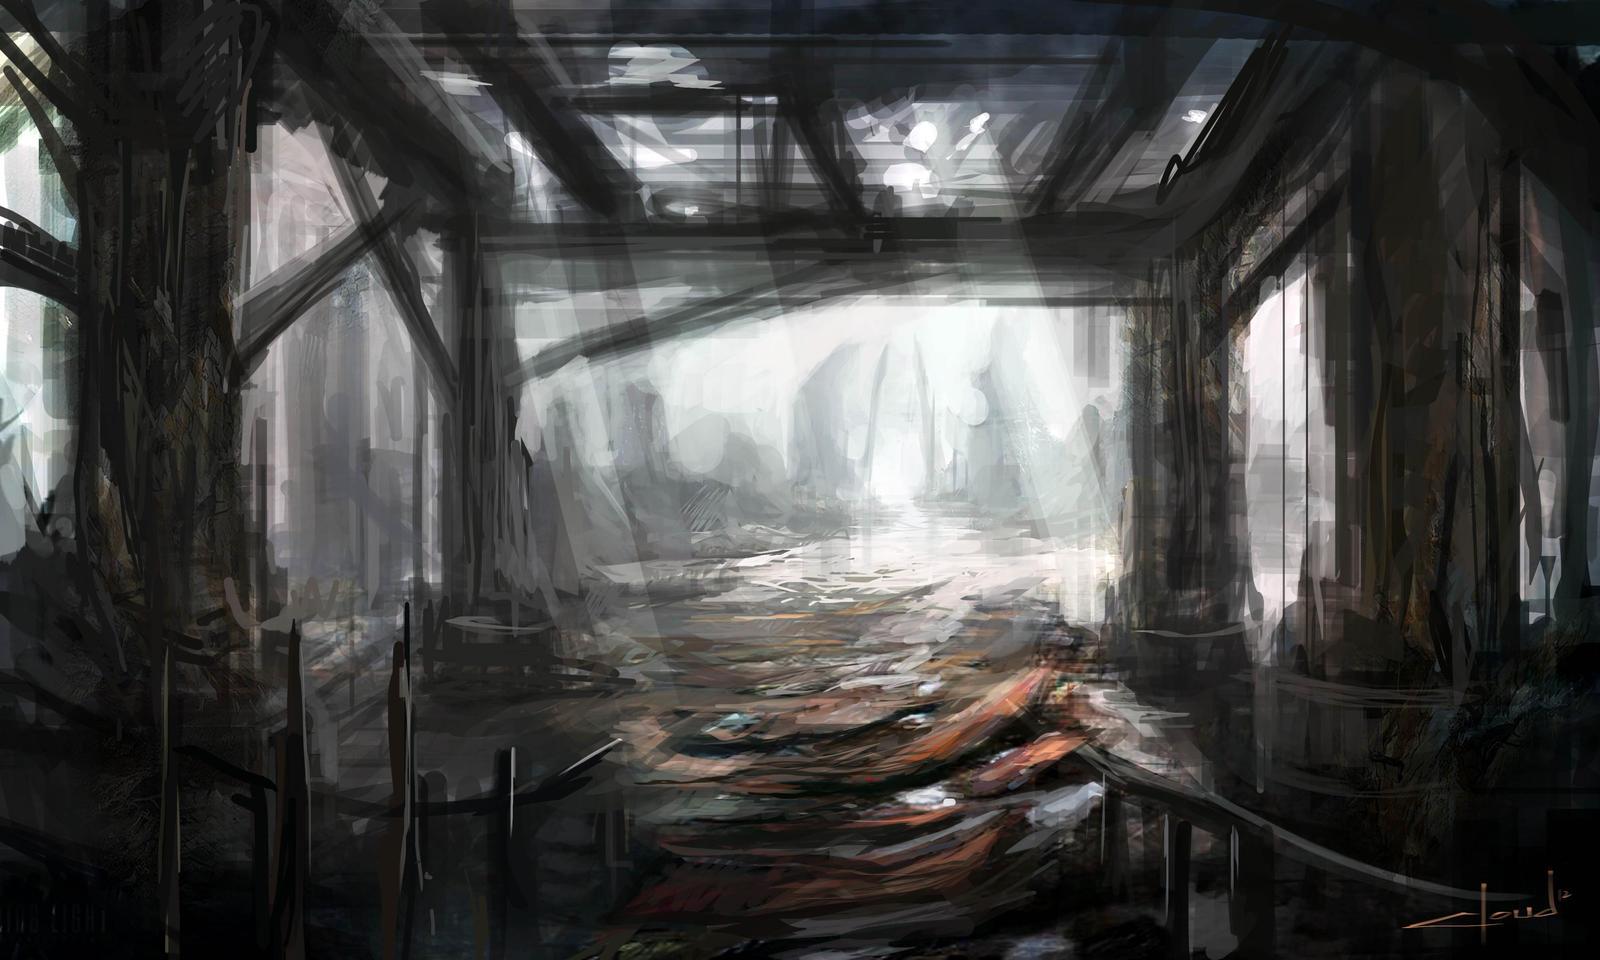 Shed by Darkcloud013